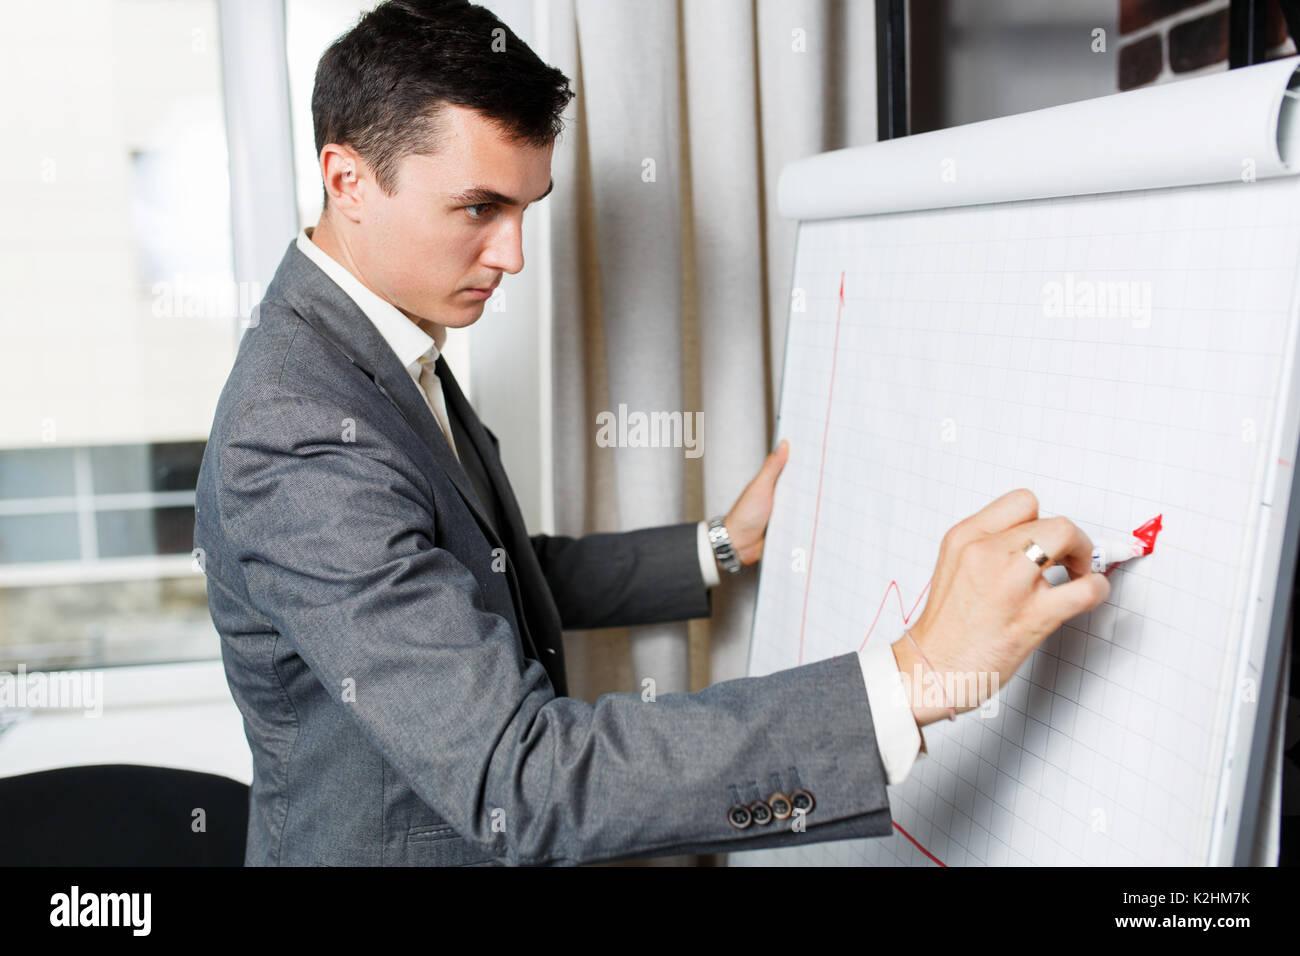 Ufficio Retro Wanita : Drawing by brunet immagini & drawing by brunet fotos stock alamy